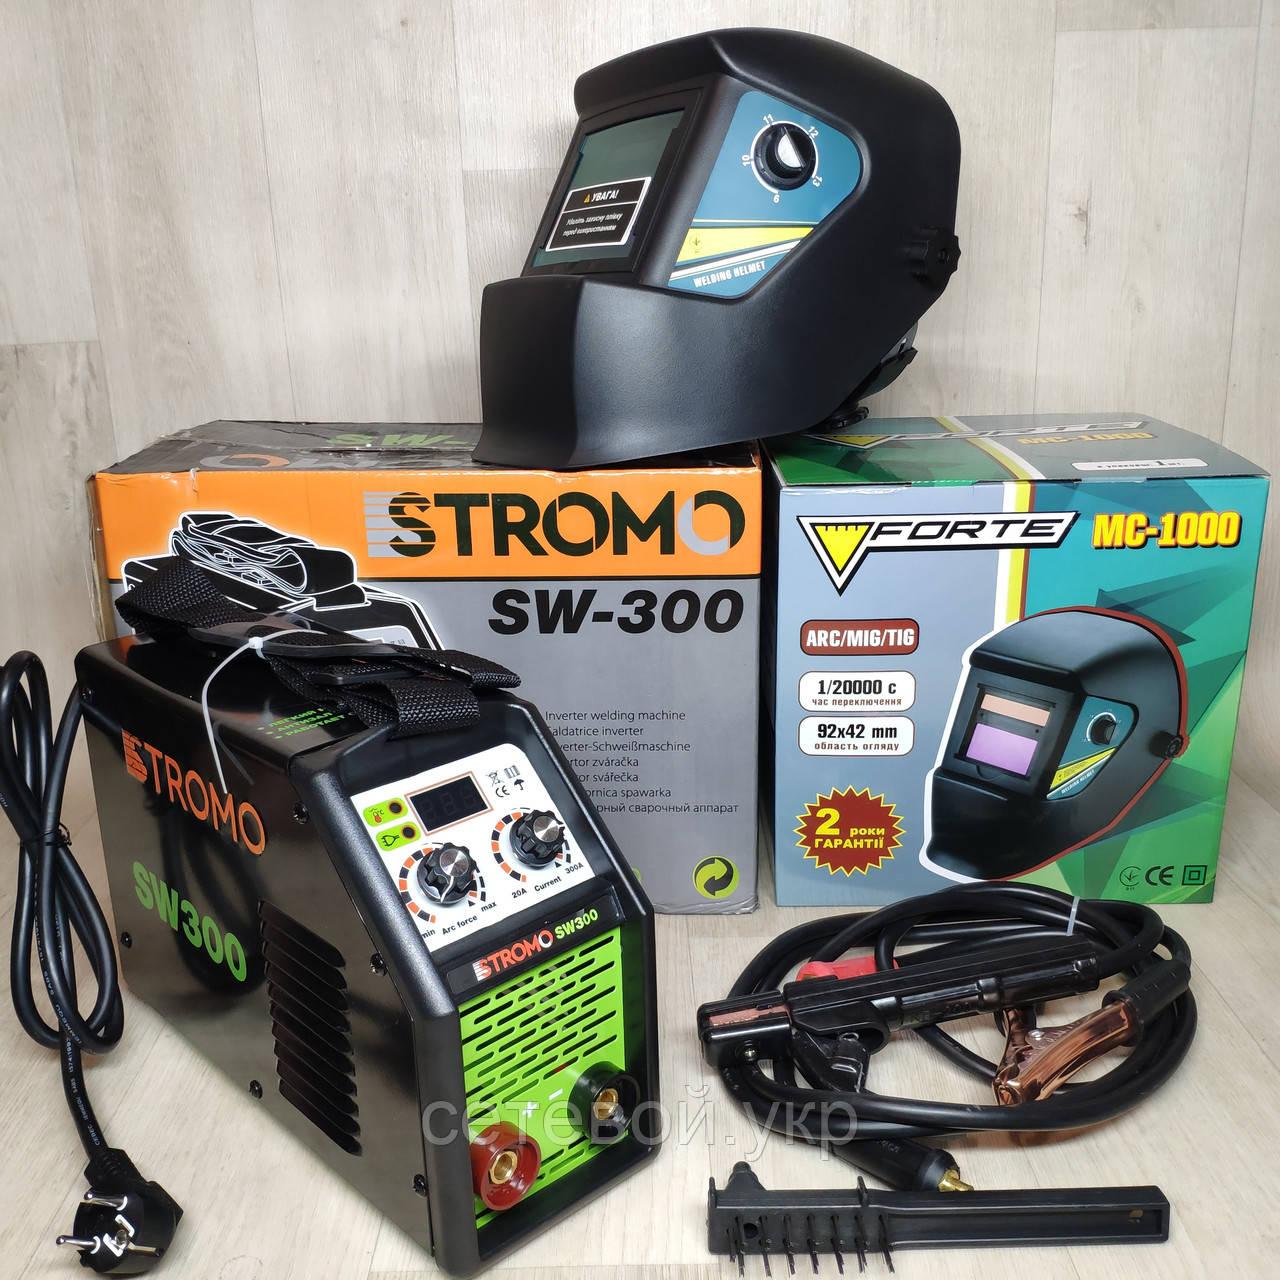 Форсаж дуги! Зварювальний апарат Stromo SW 300 А +Маска Хамелеон